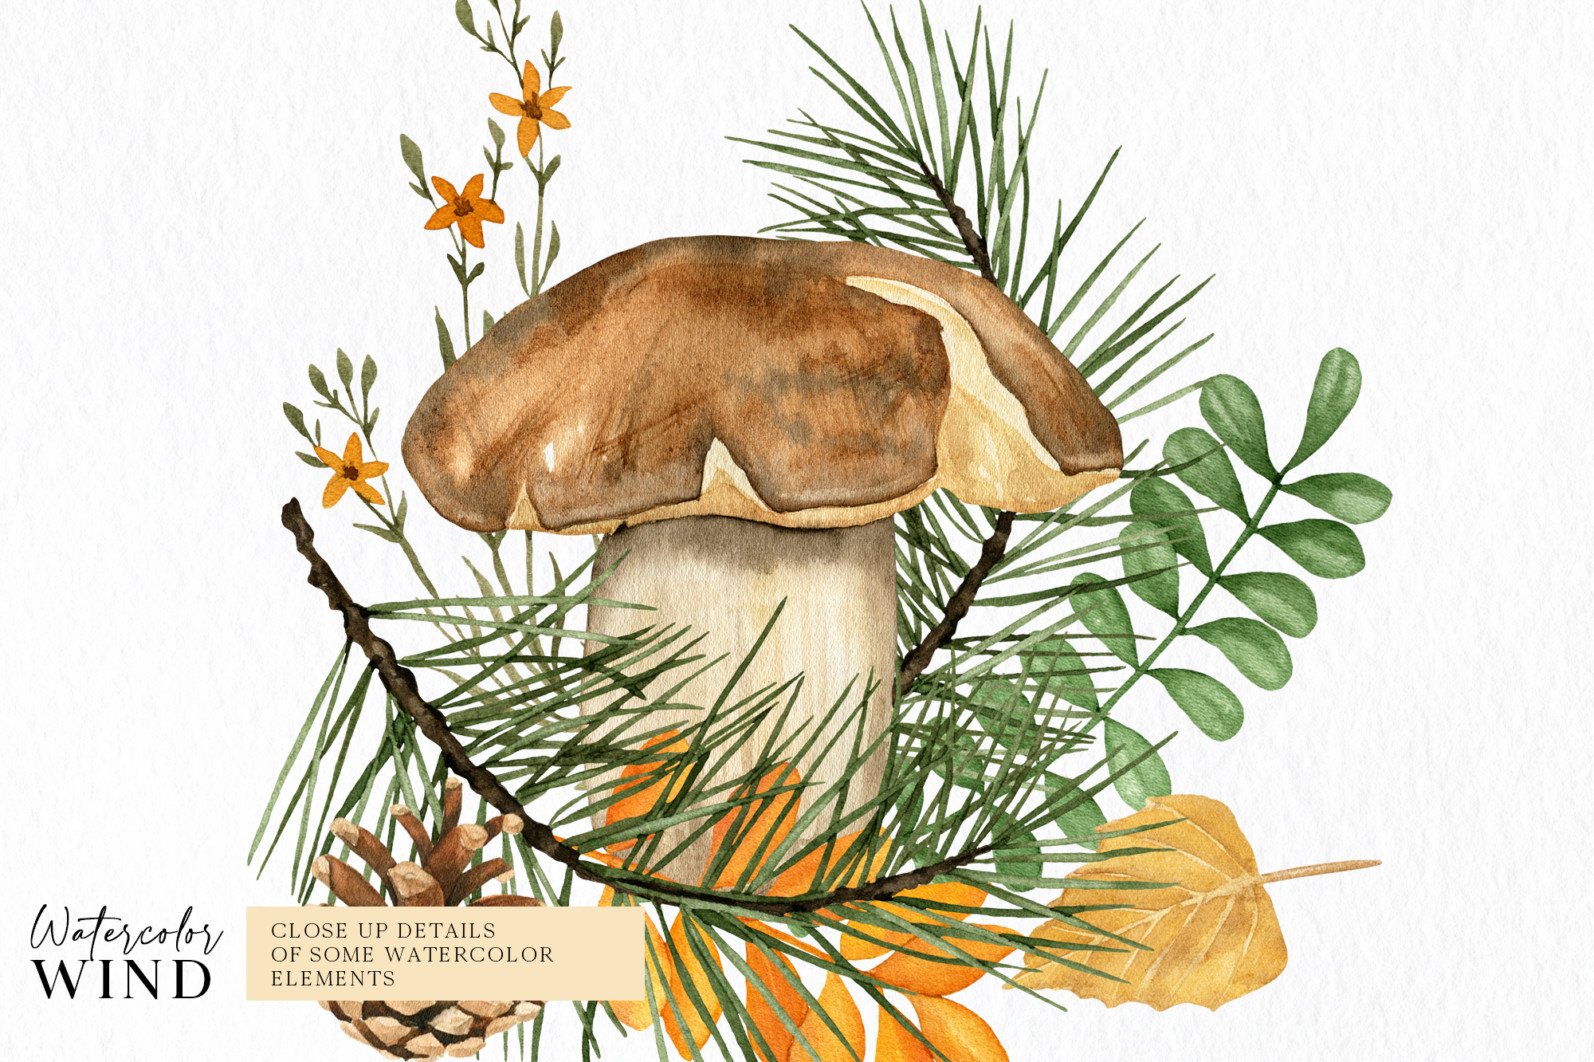 Fall forest mushrooms clipart, autumn clip art - 04 compos -